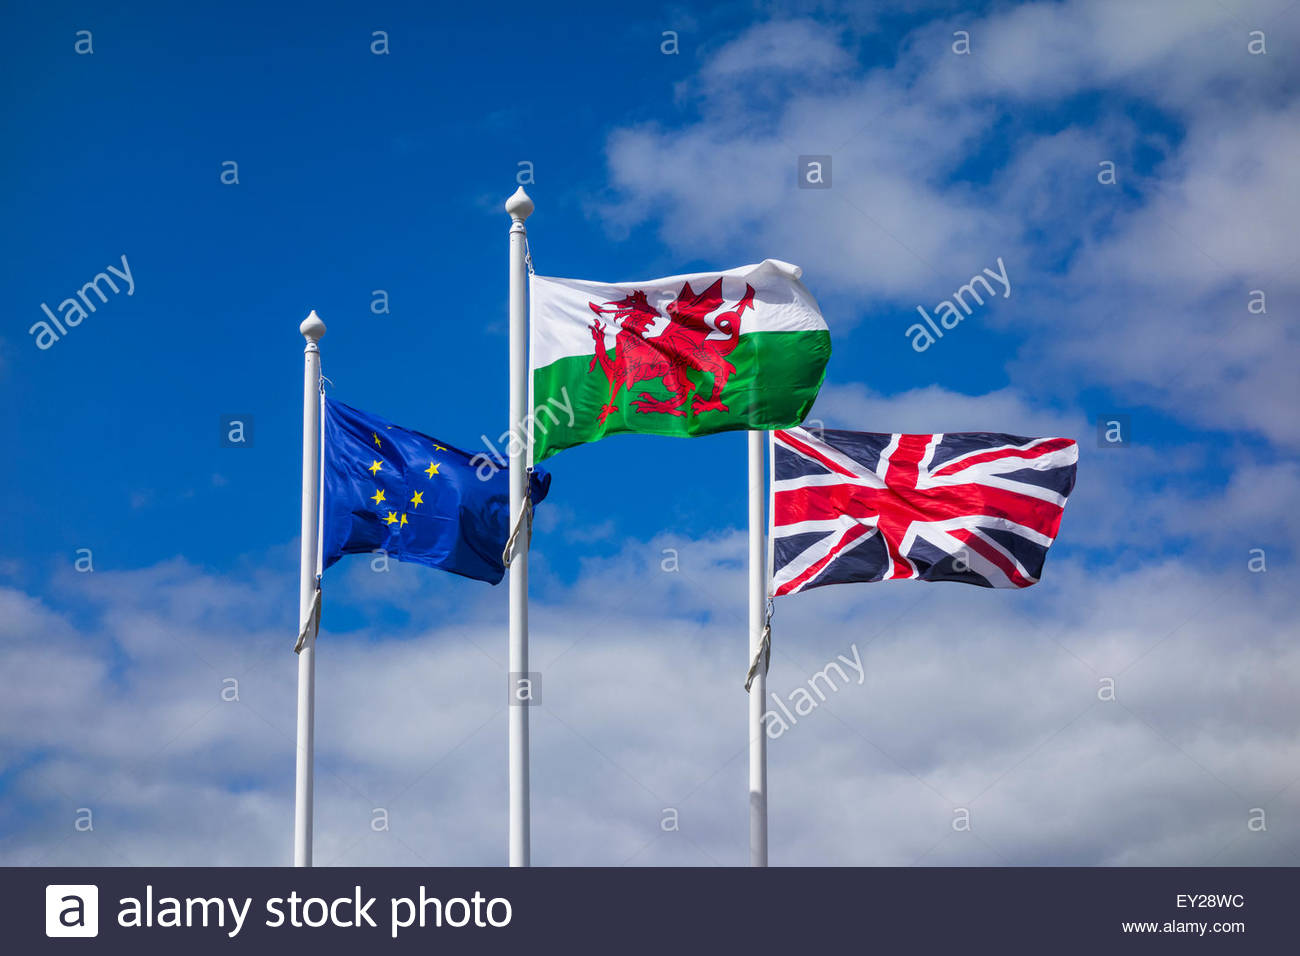 Flags of Wales United Kingdom and European Union – EU flag Union Jack and Welsh flag - Stock Image